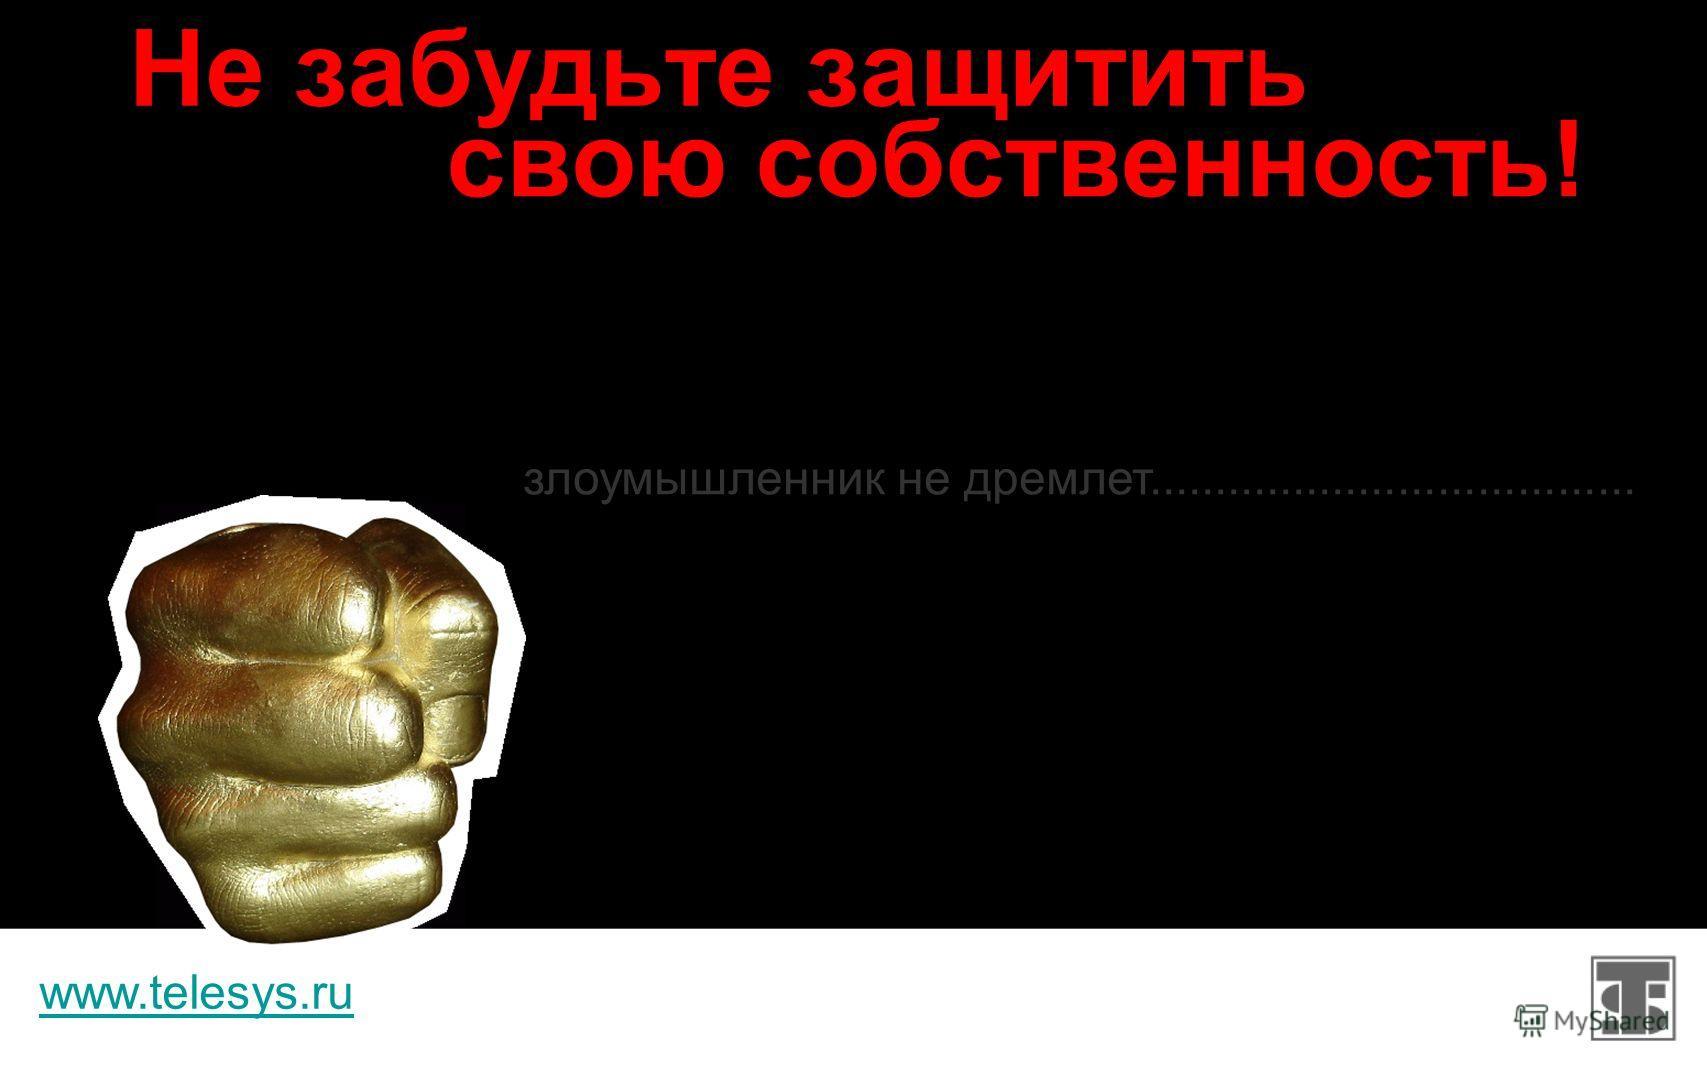 Закрыли дачный сезон? www.telesys.ru